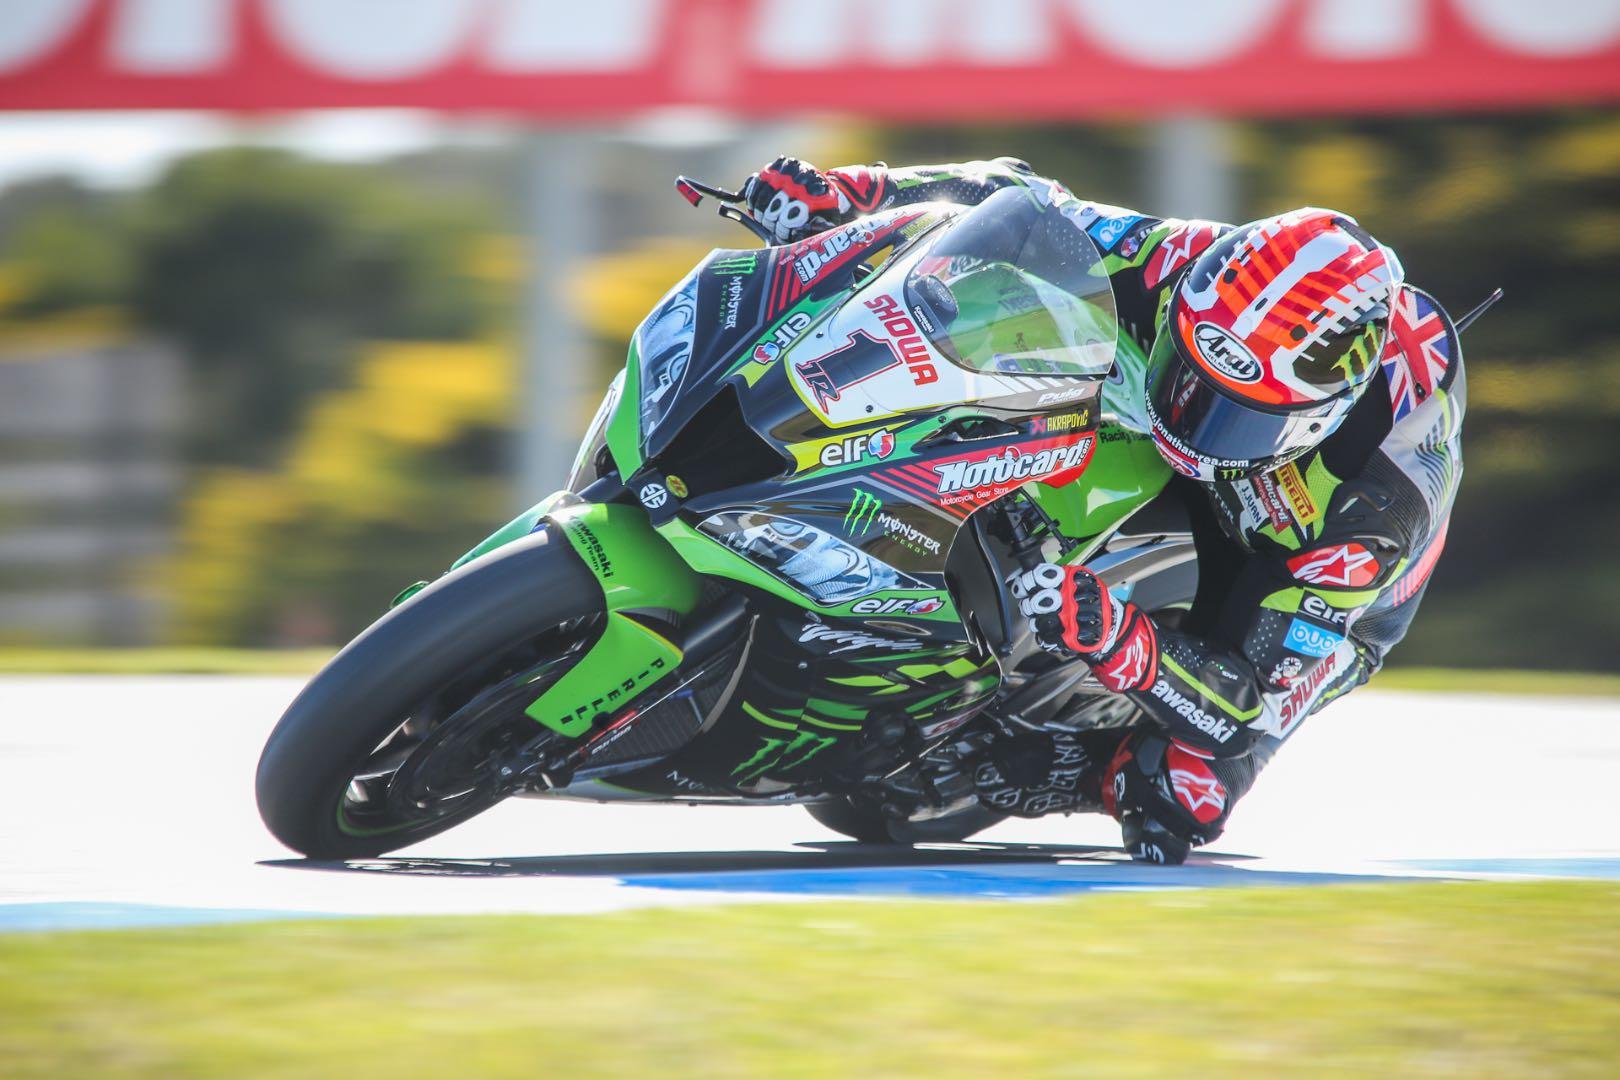 2019 Australia World Superbike Race 1 Results, Phillip Island kawasaki Jonathan Rea